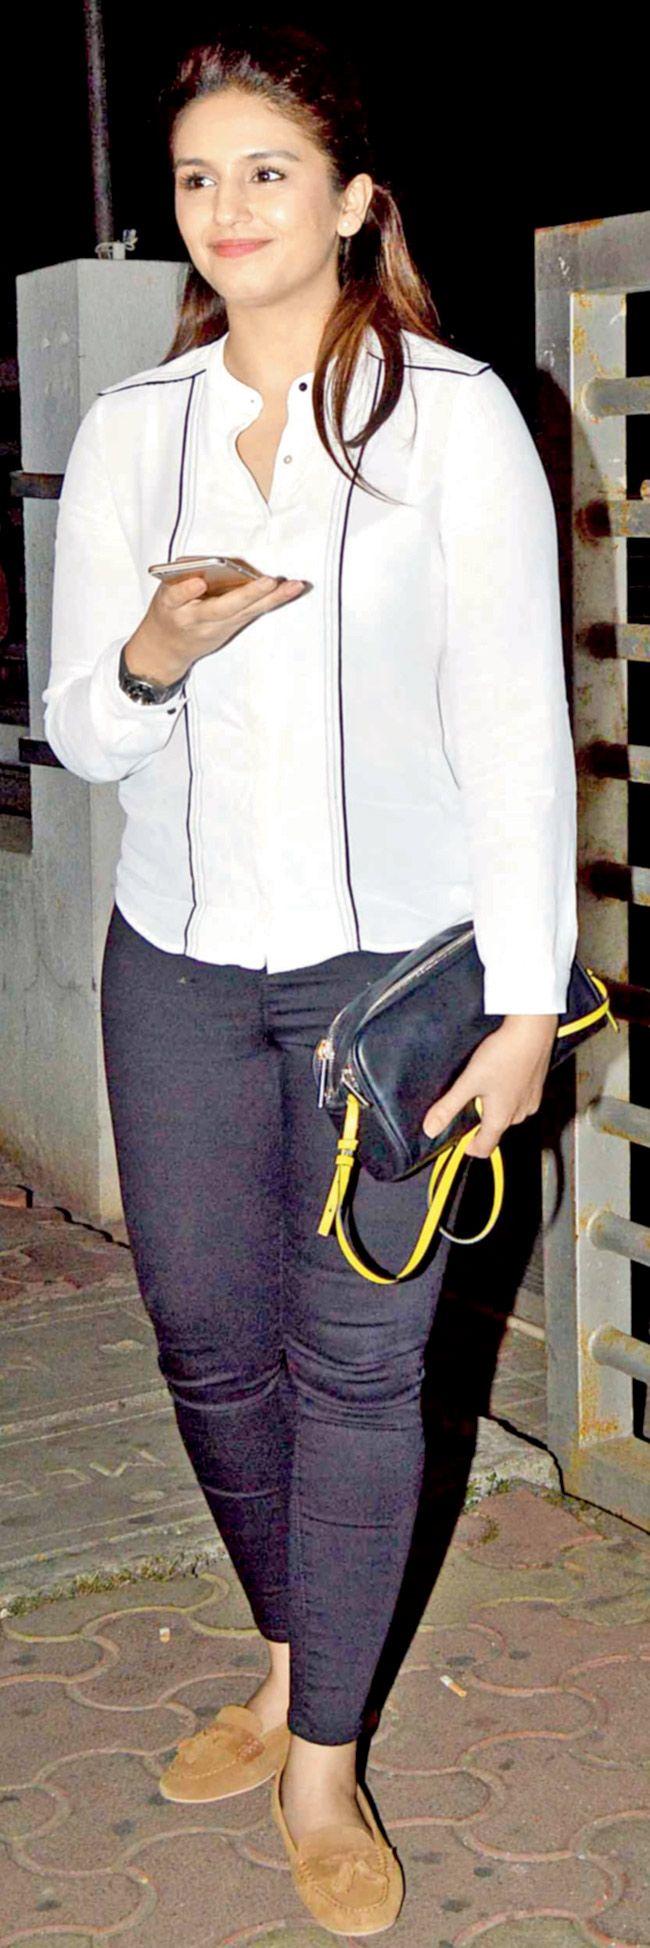 Huma Qureshi at a movie outing.